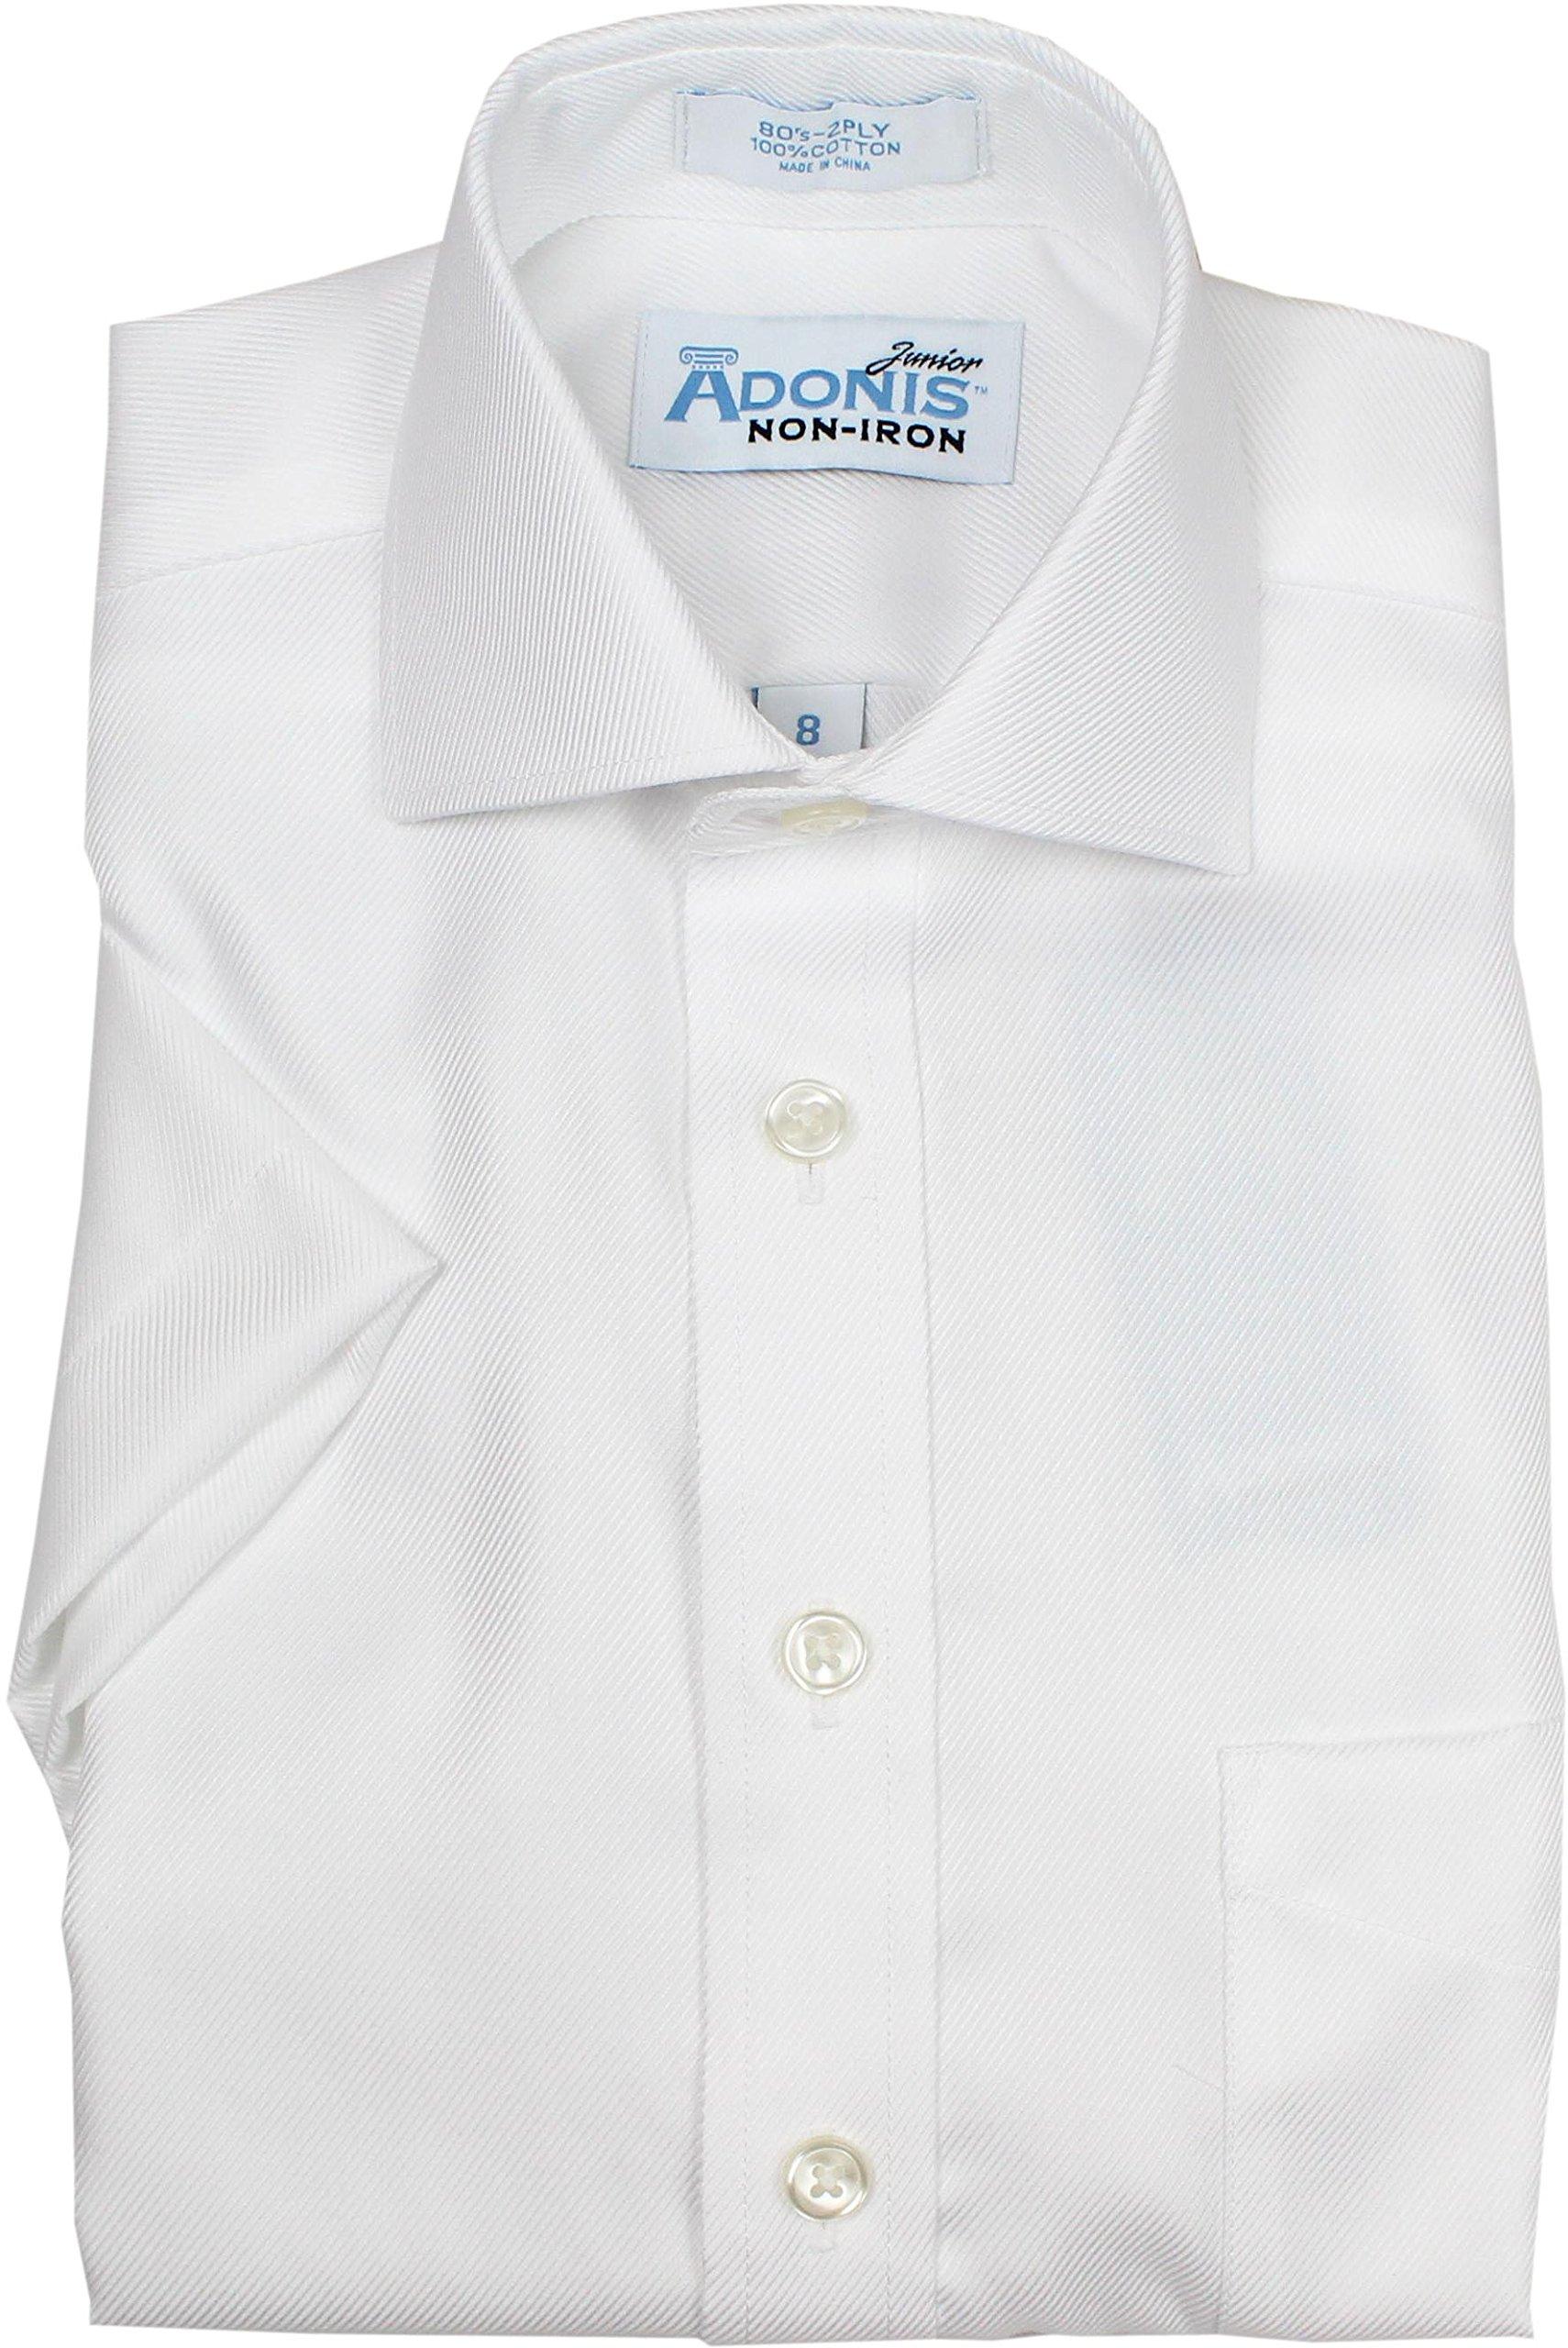 Adonis Boys 100% Cotton White Short Sleeve Textured Dress Shirt - BCSST-59 - White, 18